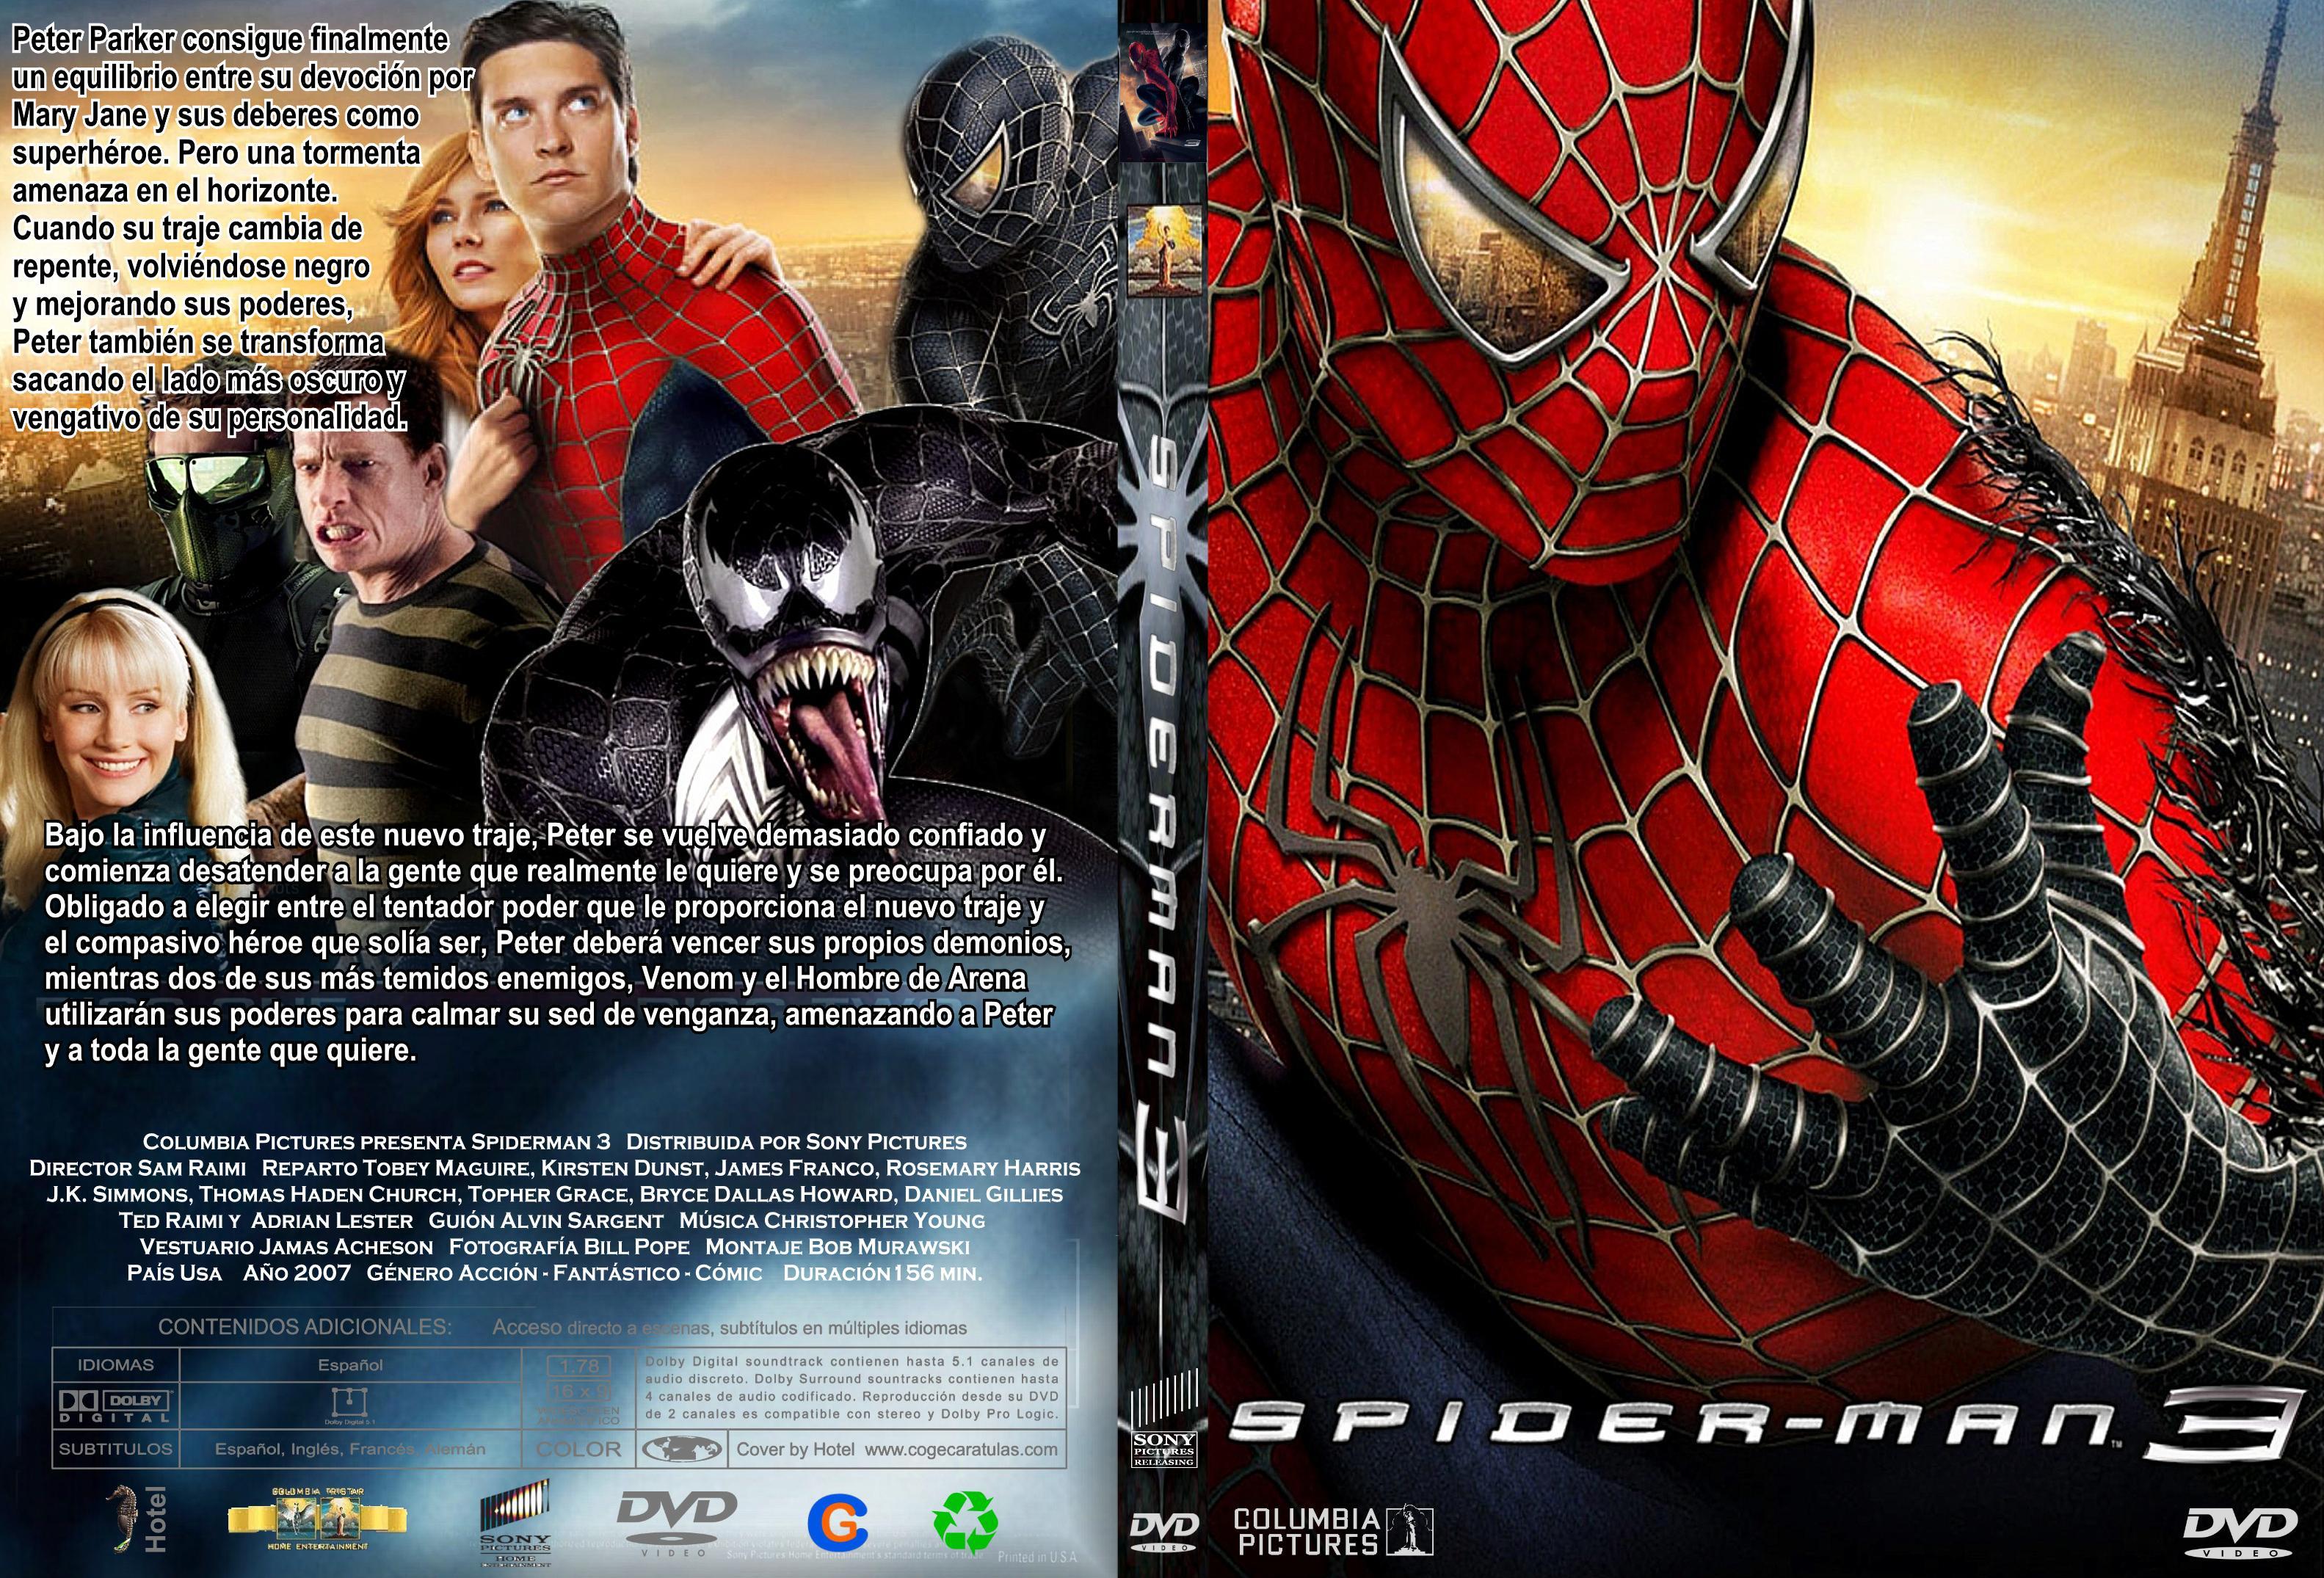 www spiderman3 com ar: